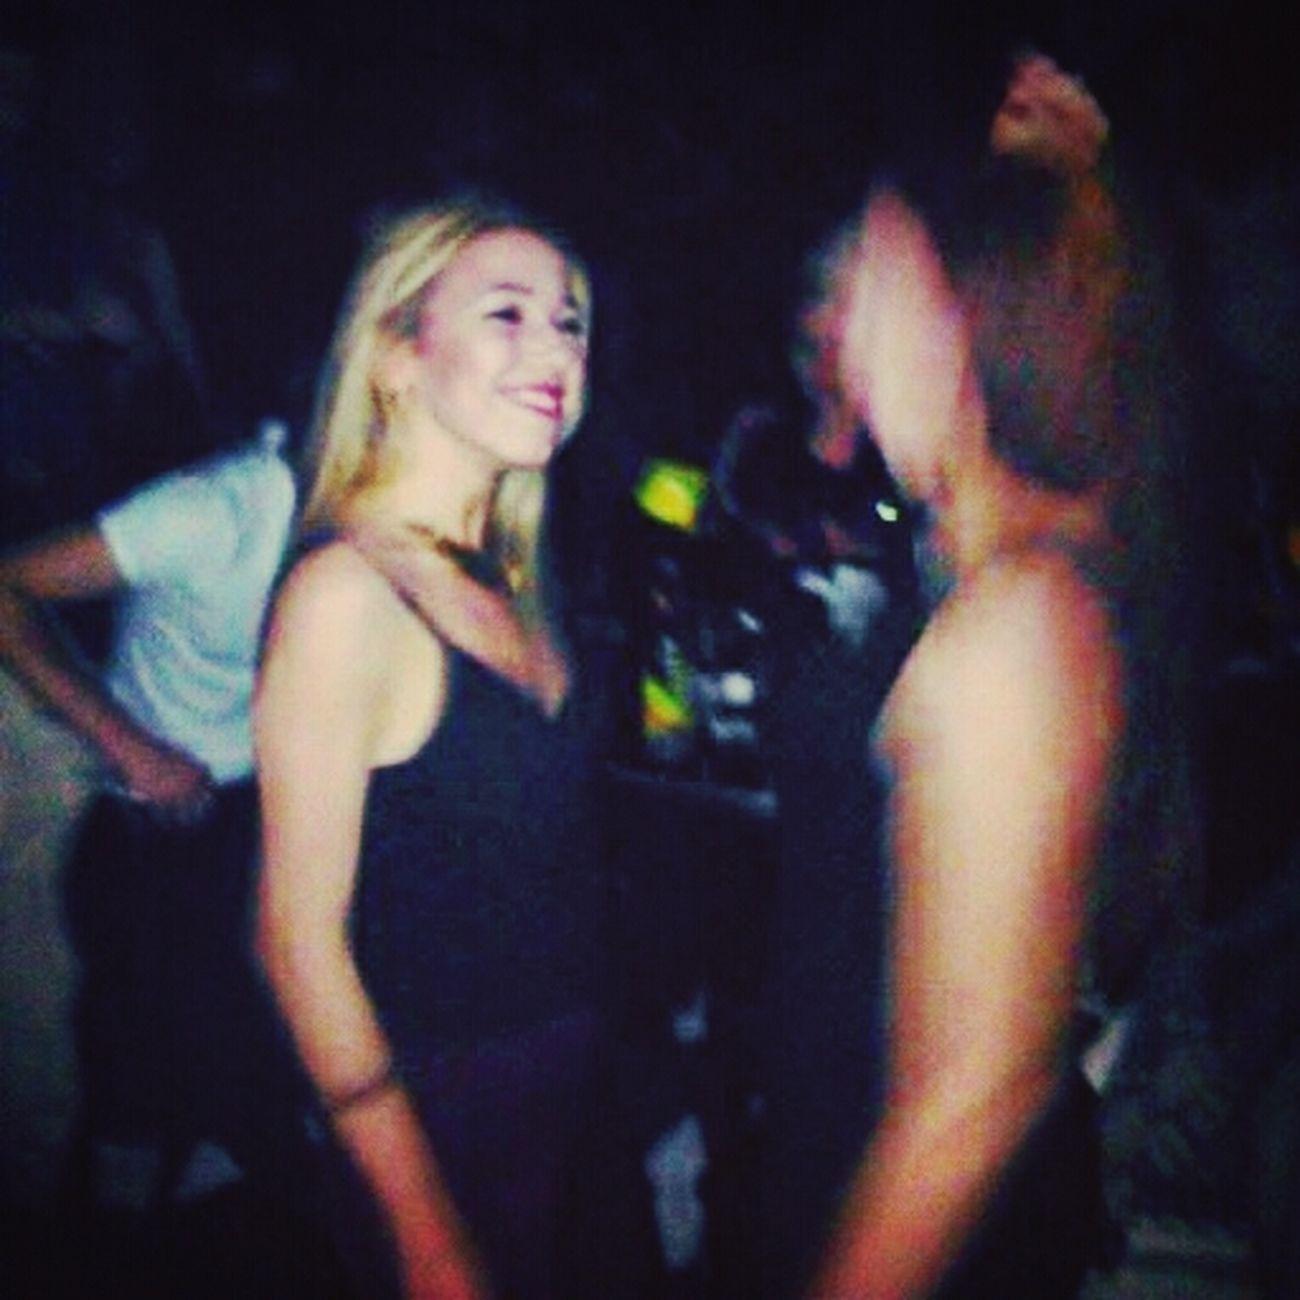 Partying Fun Night Out Dancing